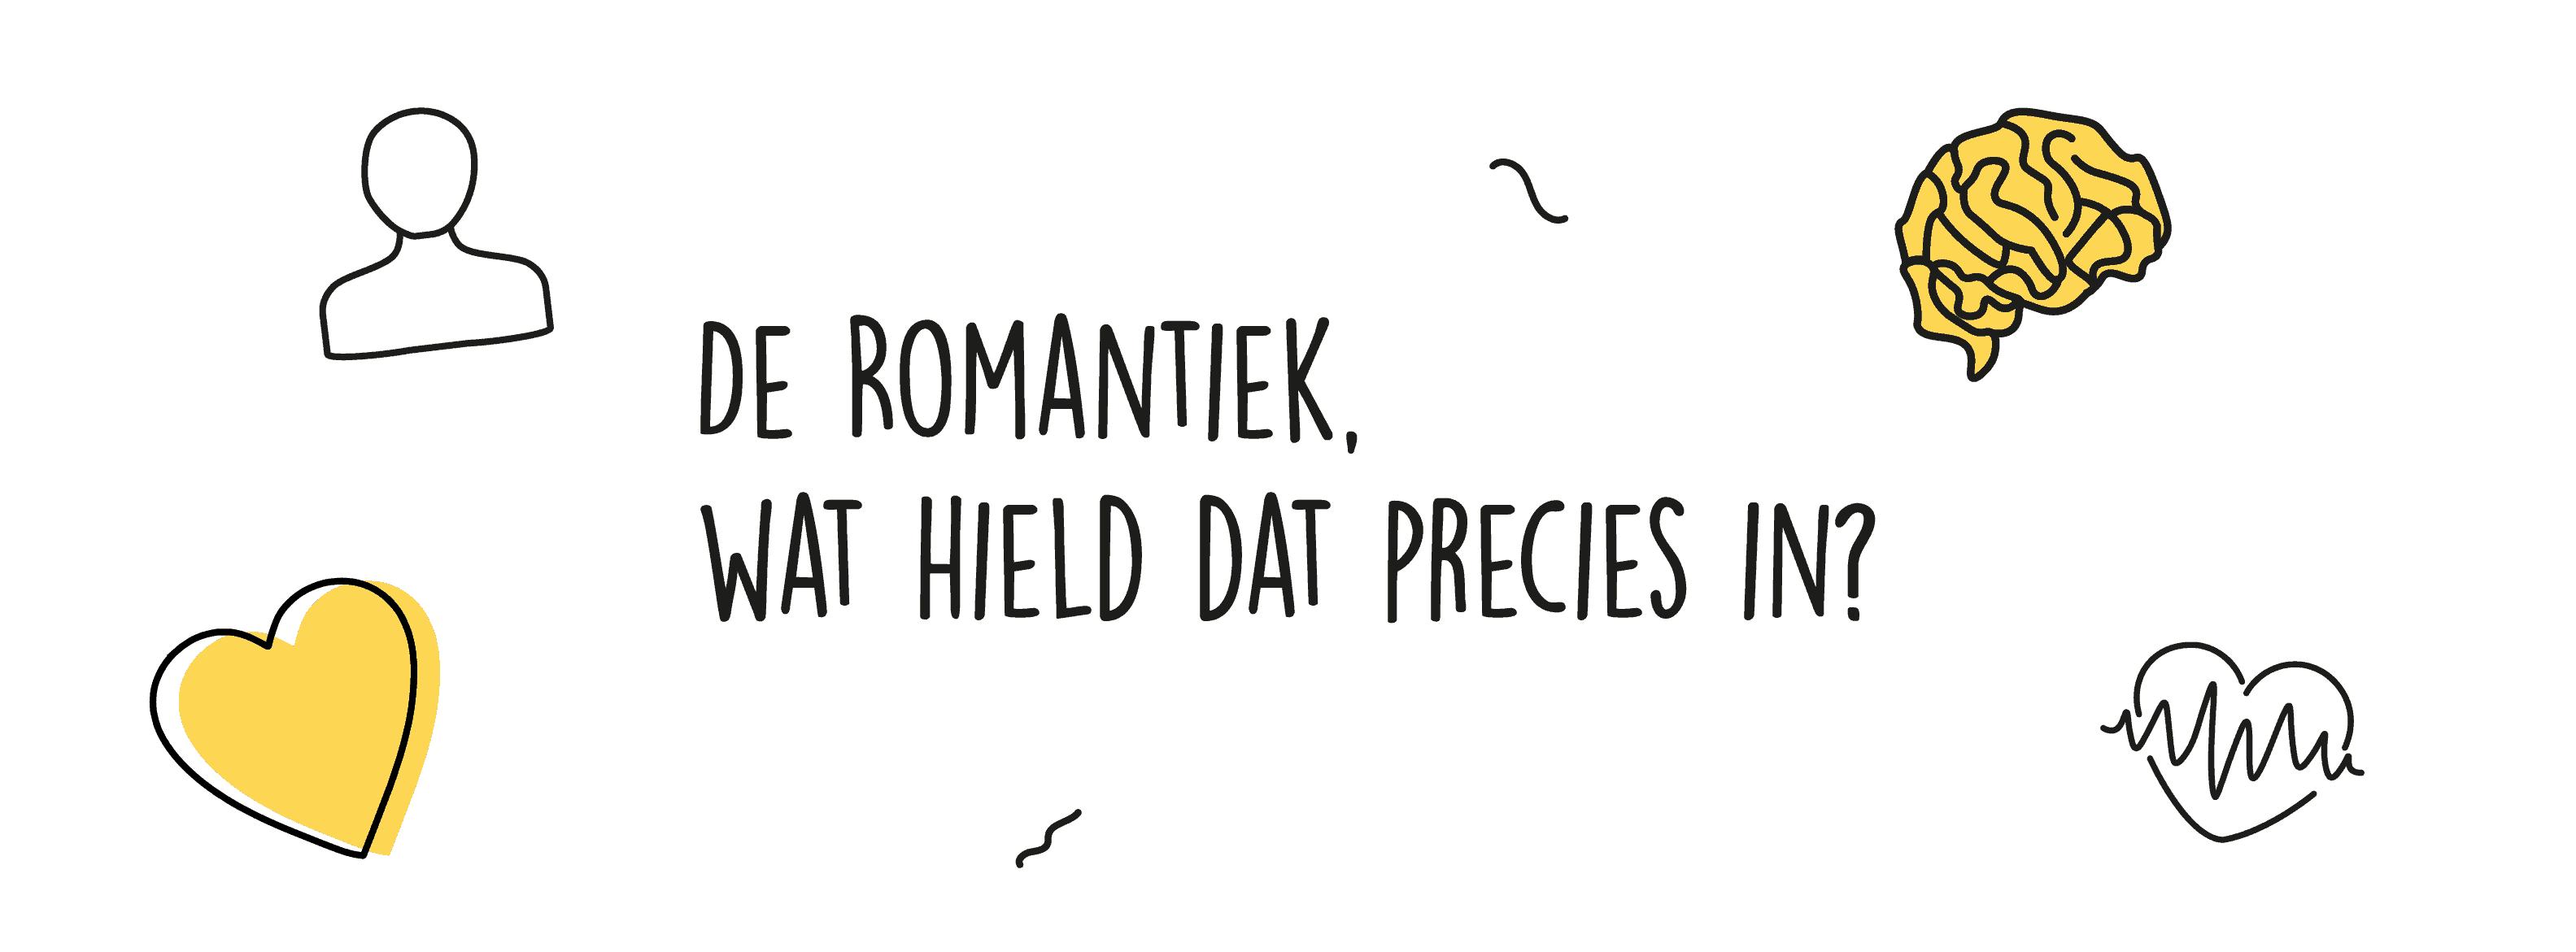 Romantiek